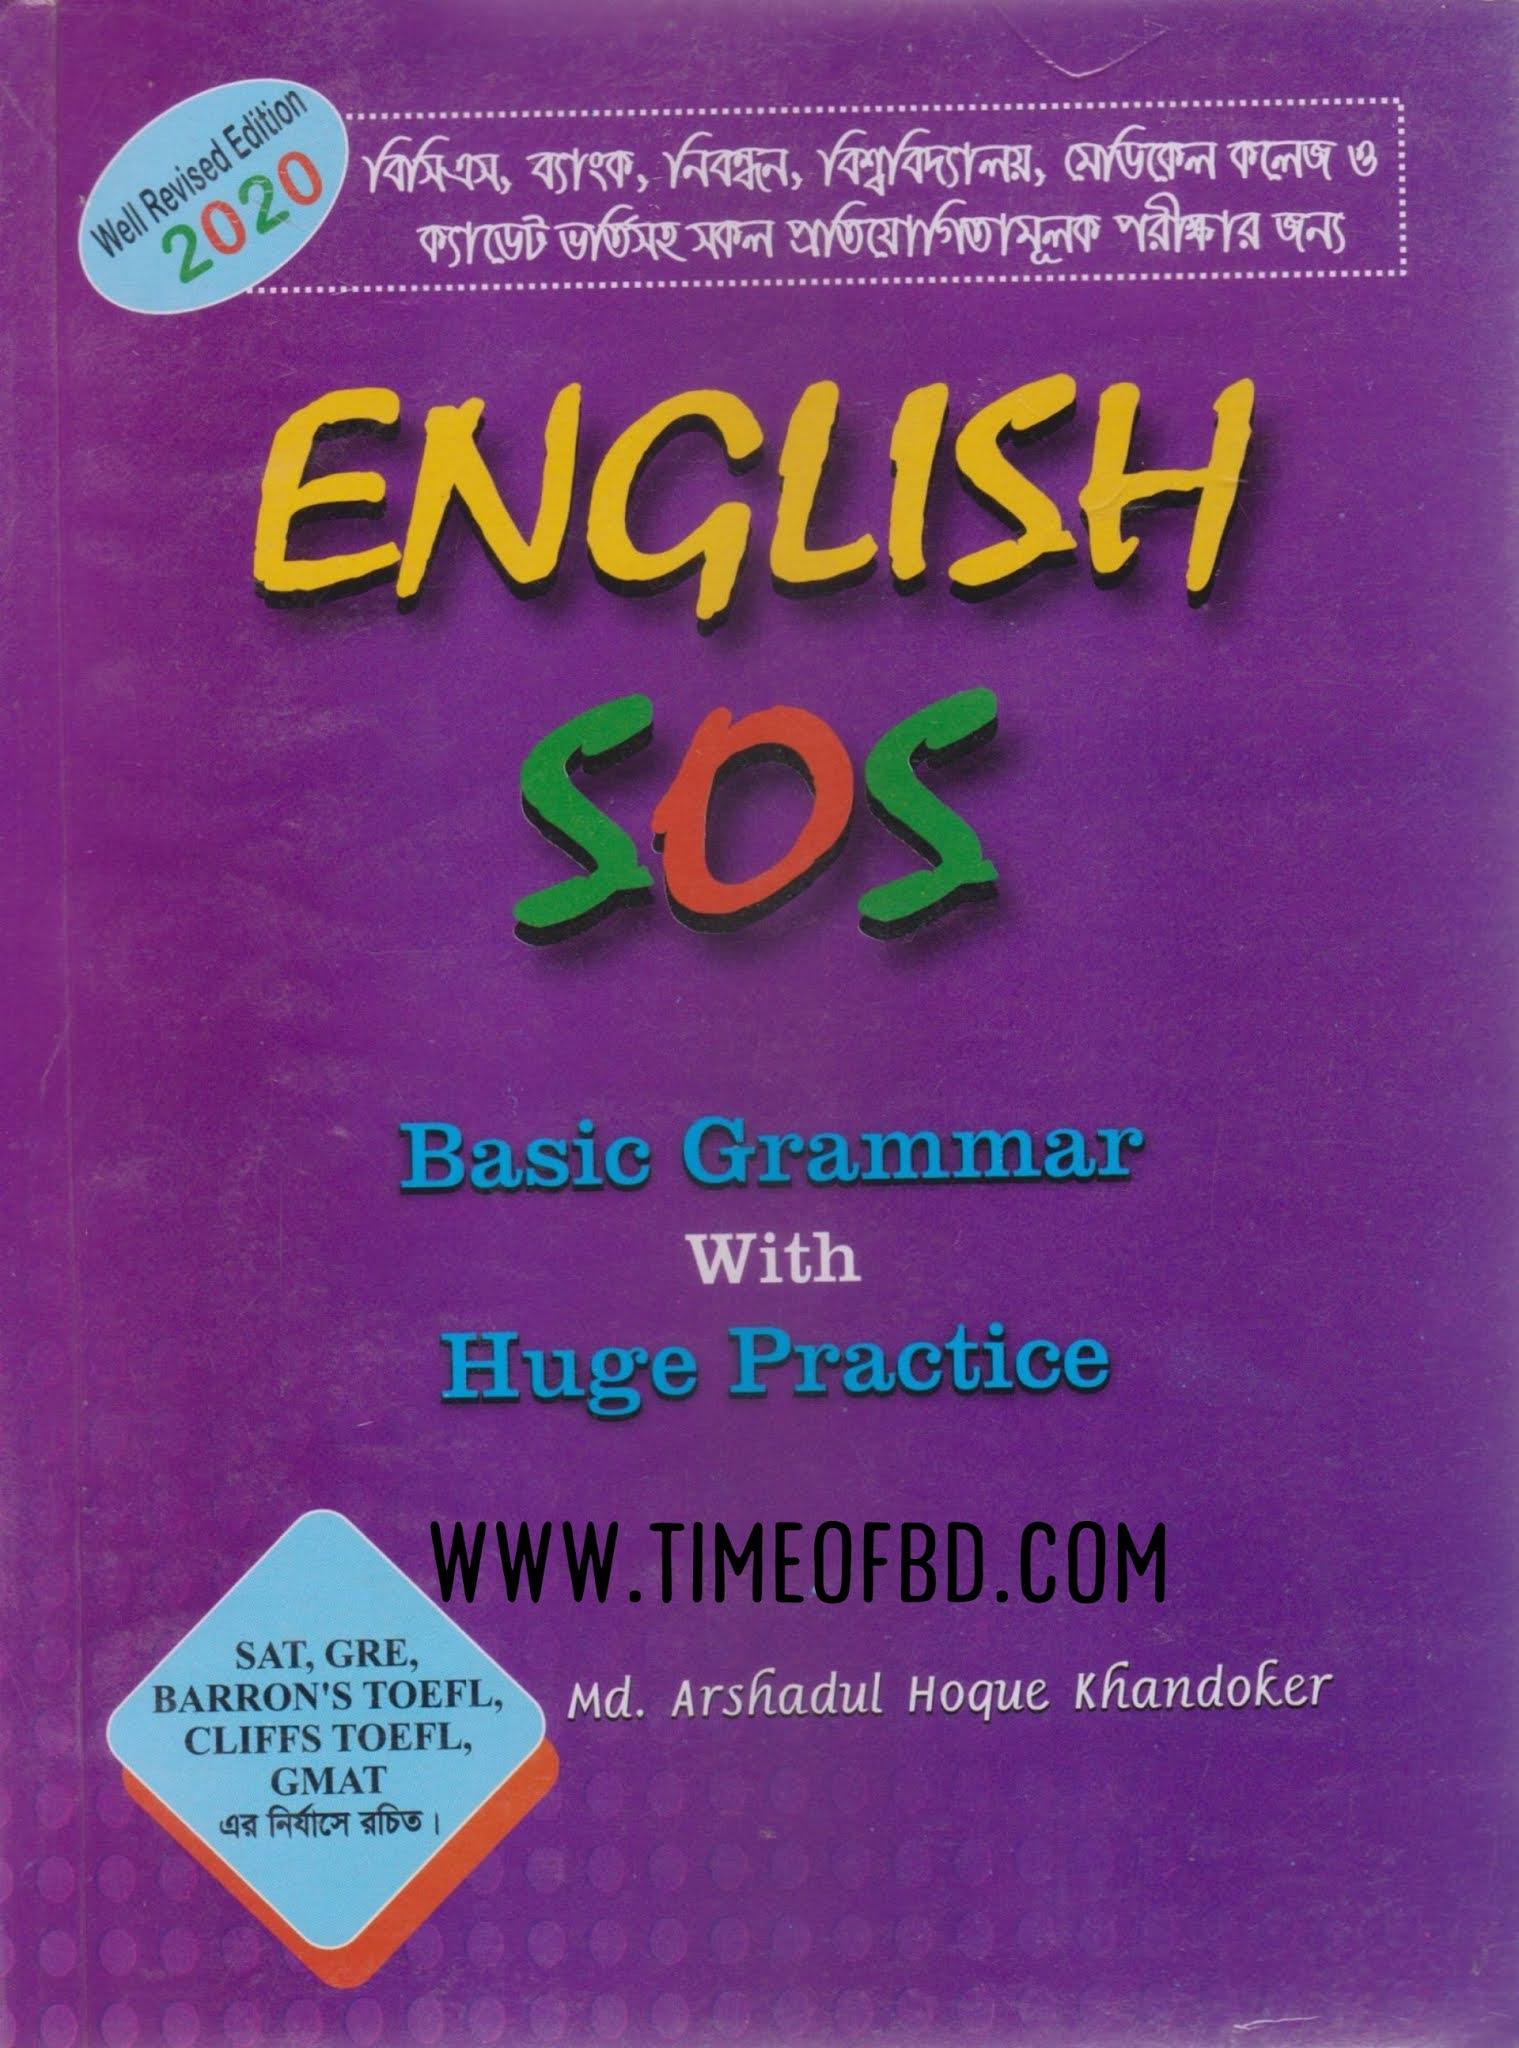 English soso book pdf download, English sos book price, English sos book online order link.